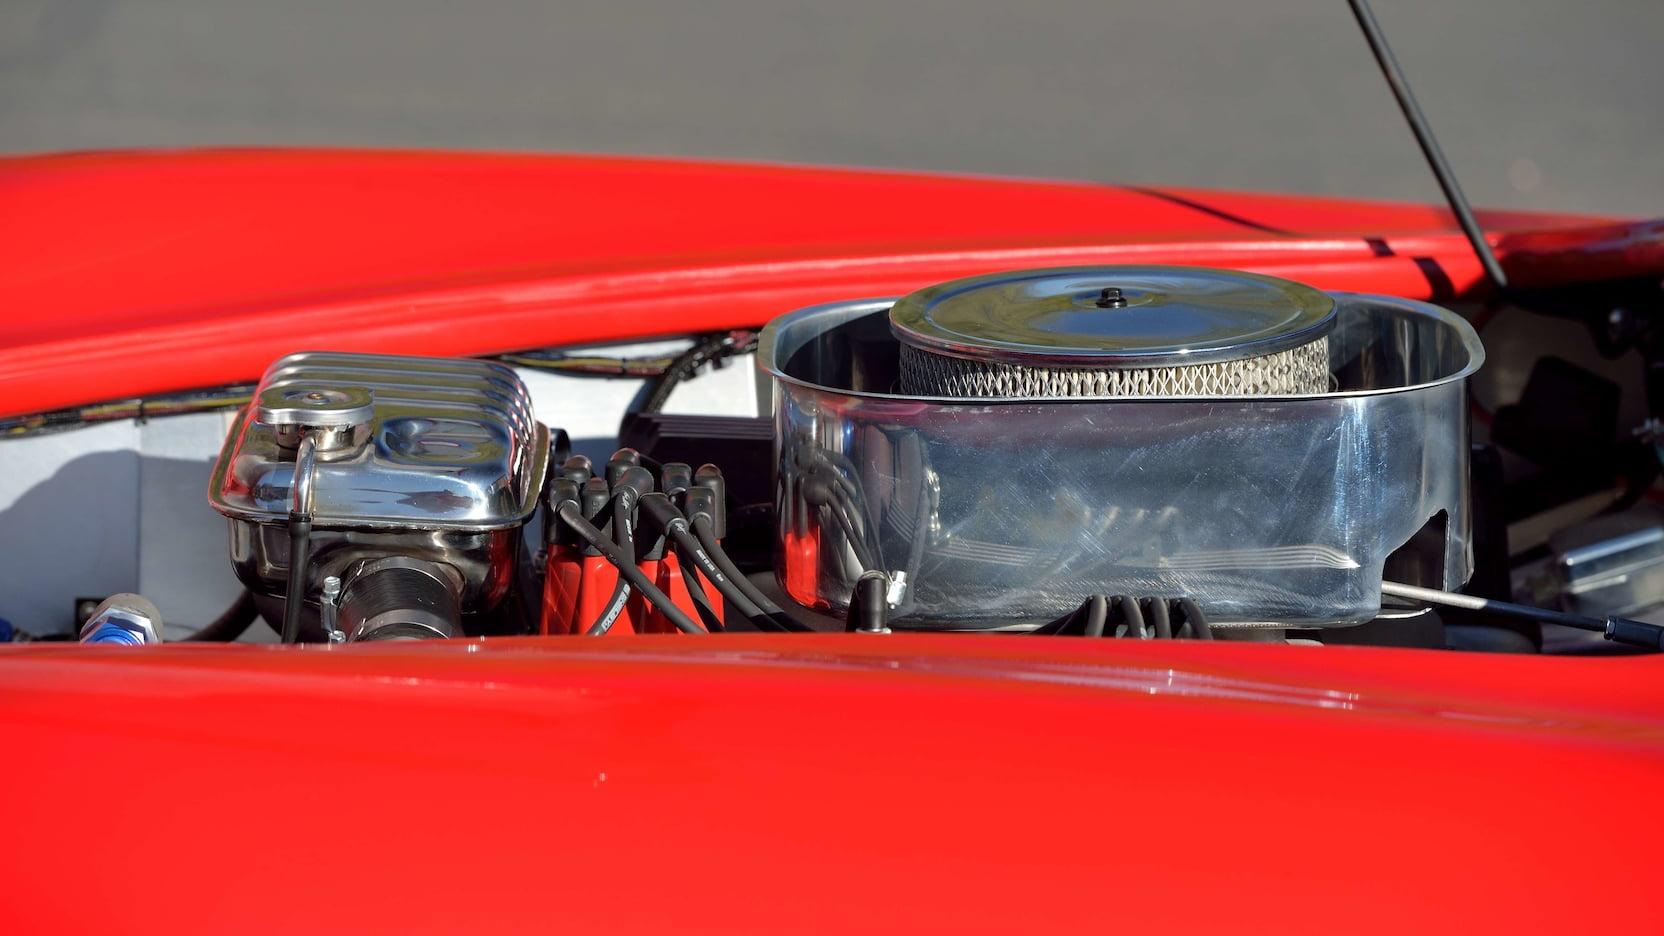 Shelby Cobra - Engine Alternate Angle